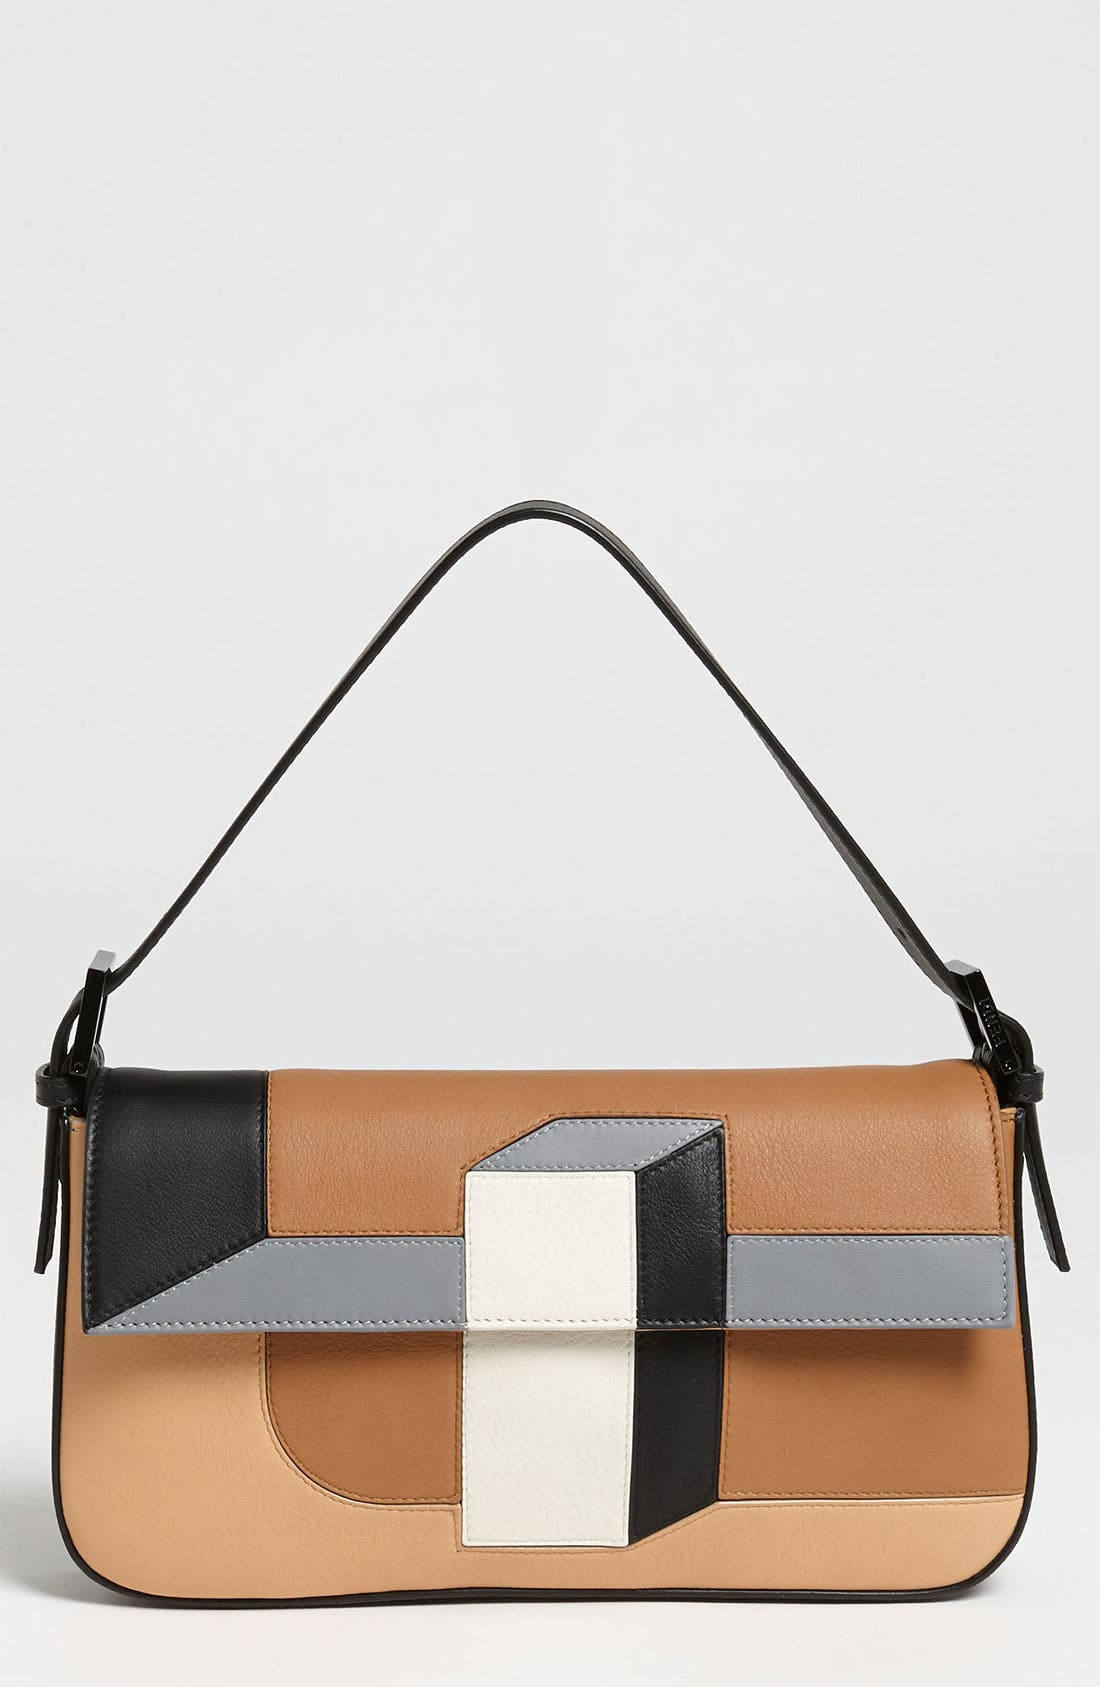 Alternate Image 1 Selected - Fendi '3D' Leather Baguette